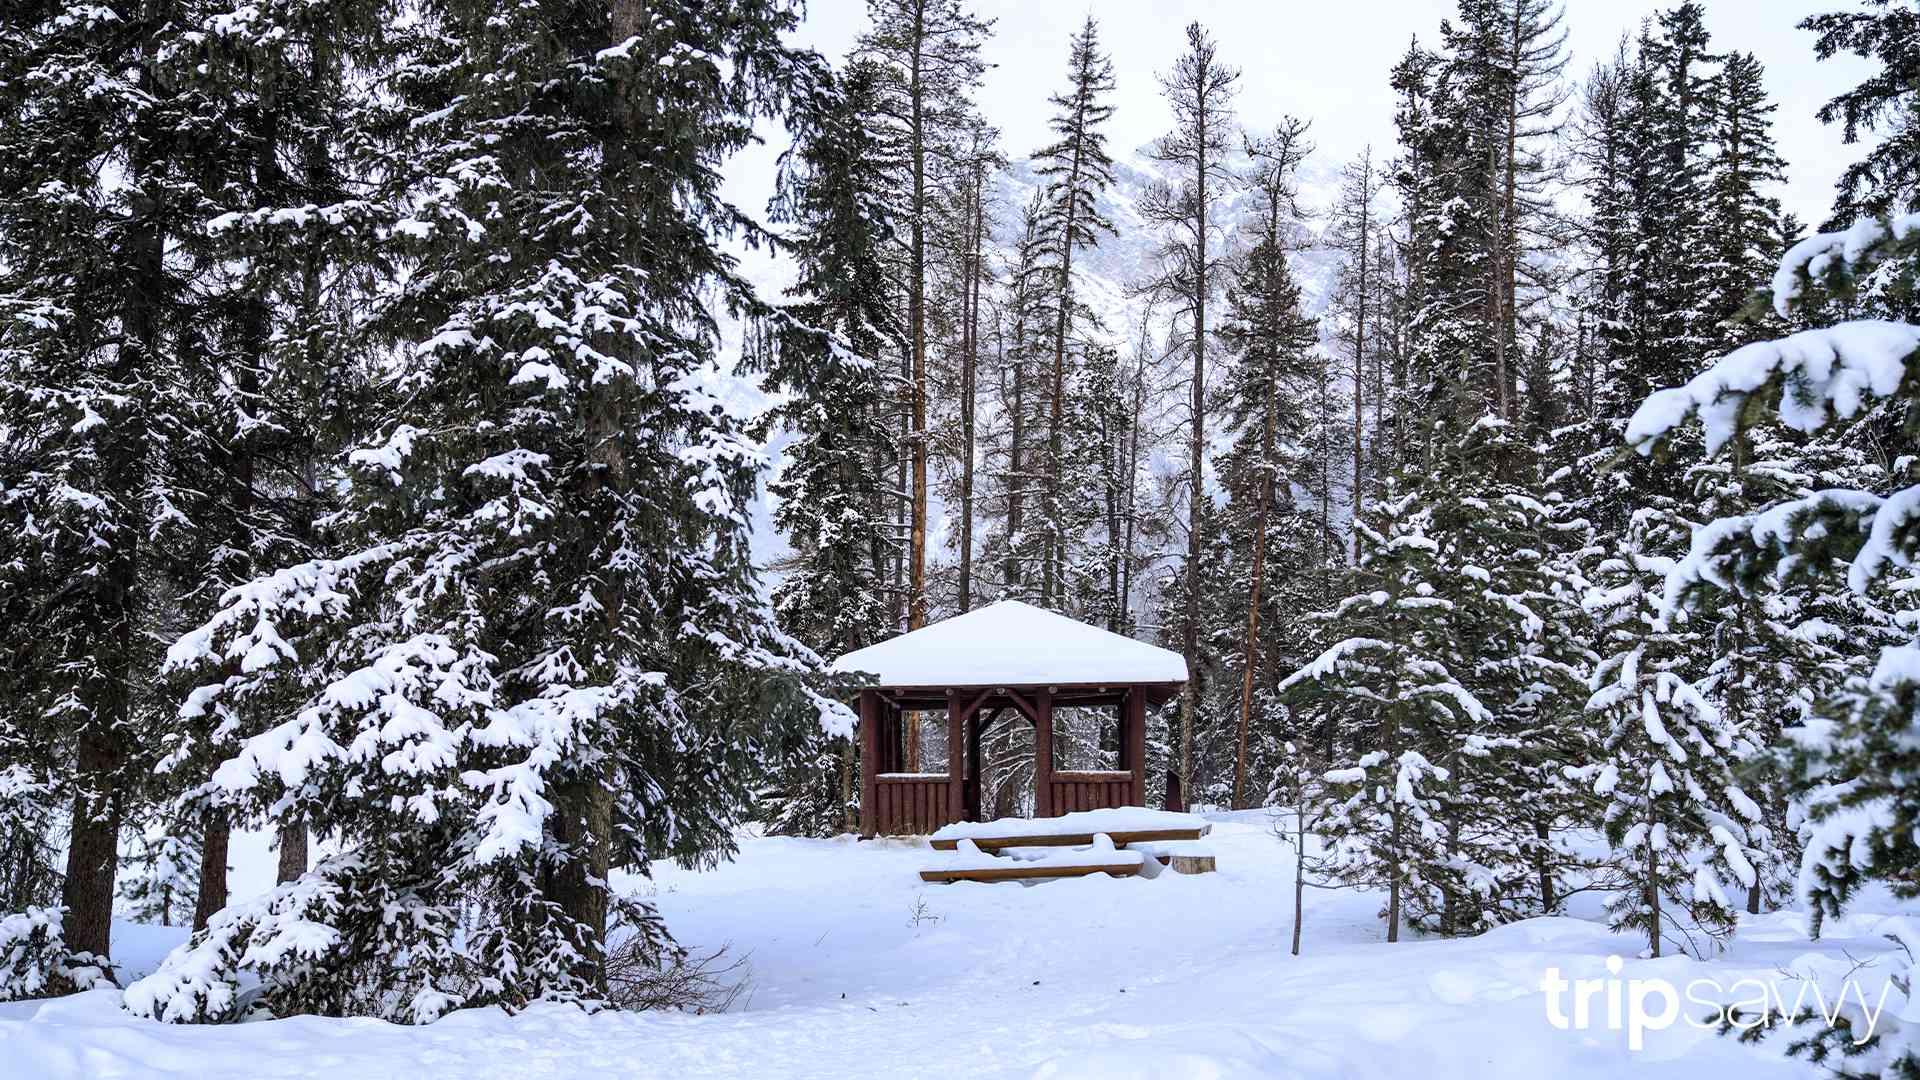 A snowy gazebo in Jasper, Canada